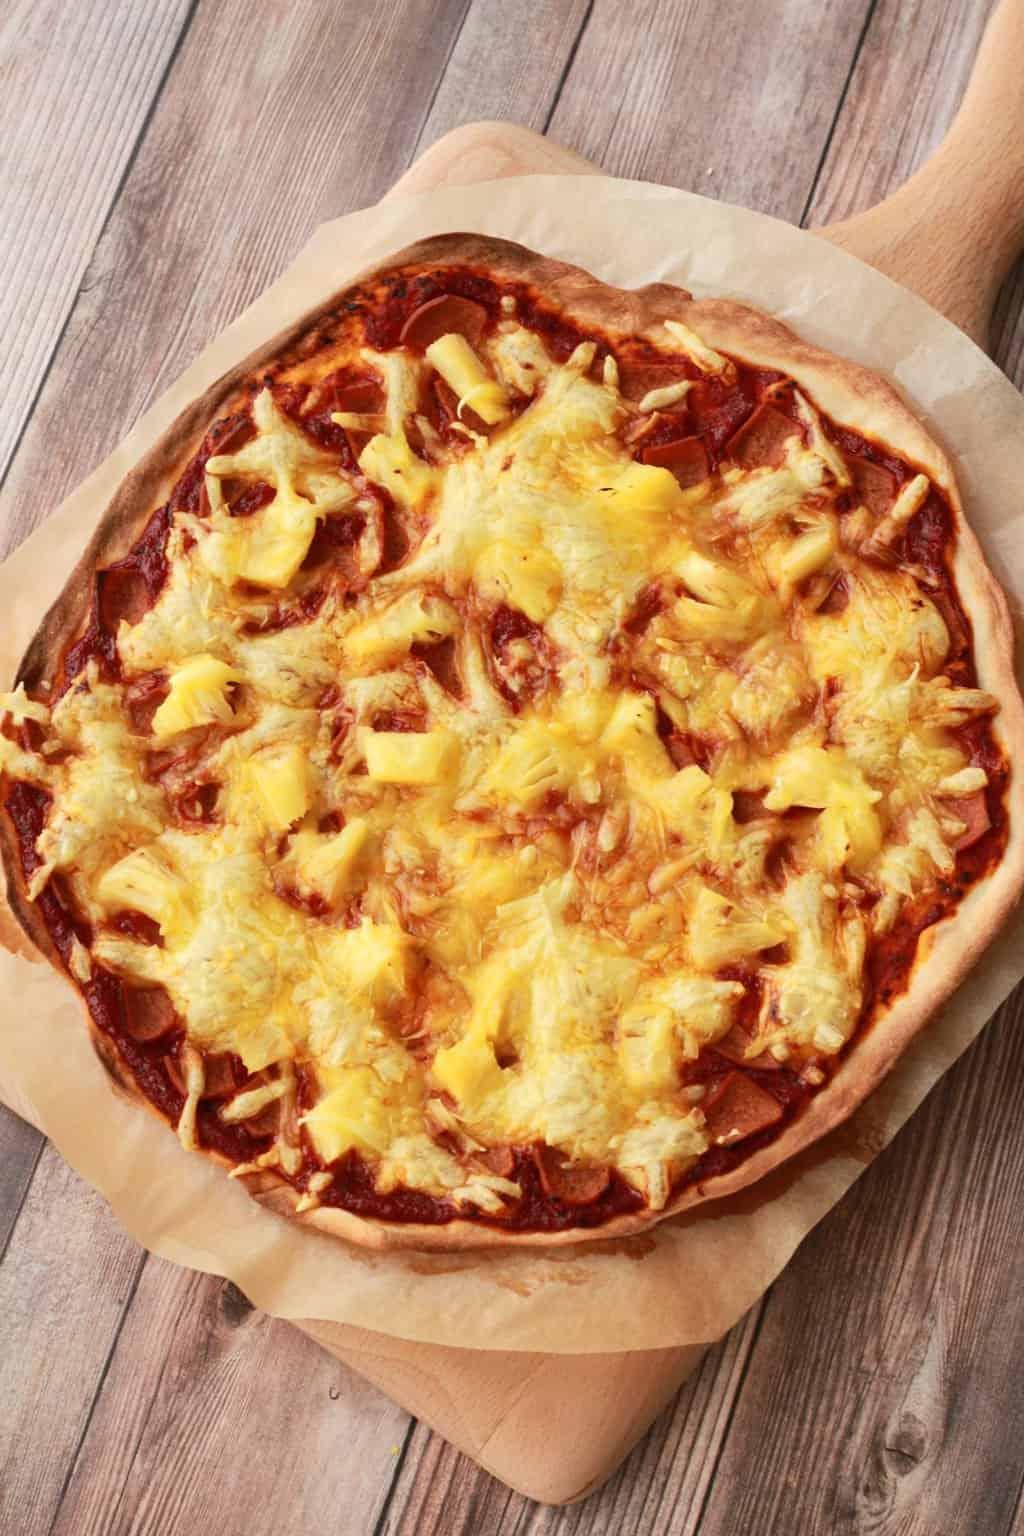 Thin-Crust Vegan Pizza. Made from scratch with homemade vegan pizza dough, a homemade tomato sauce and Hawaiian toppings! #vegan #lovingitvegan #veganpizza #pizza